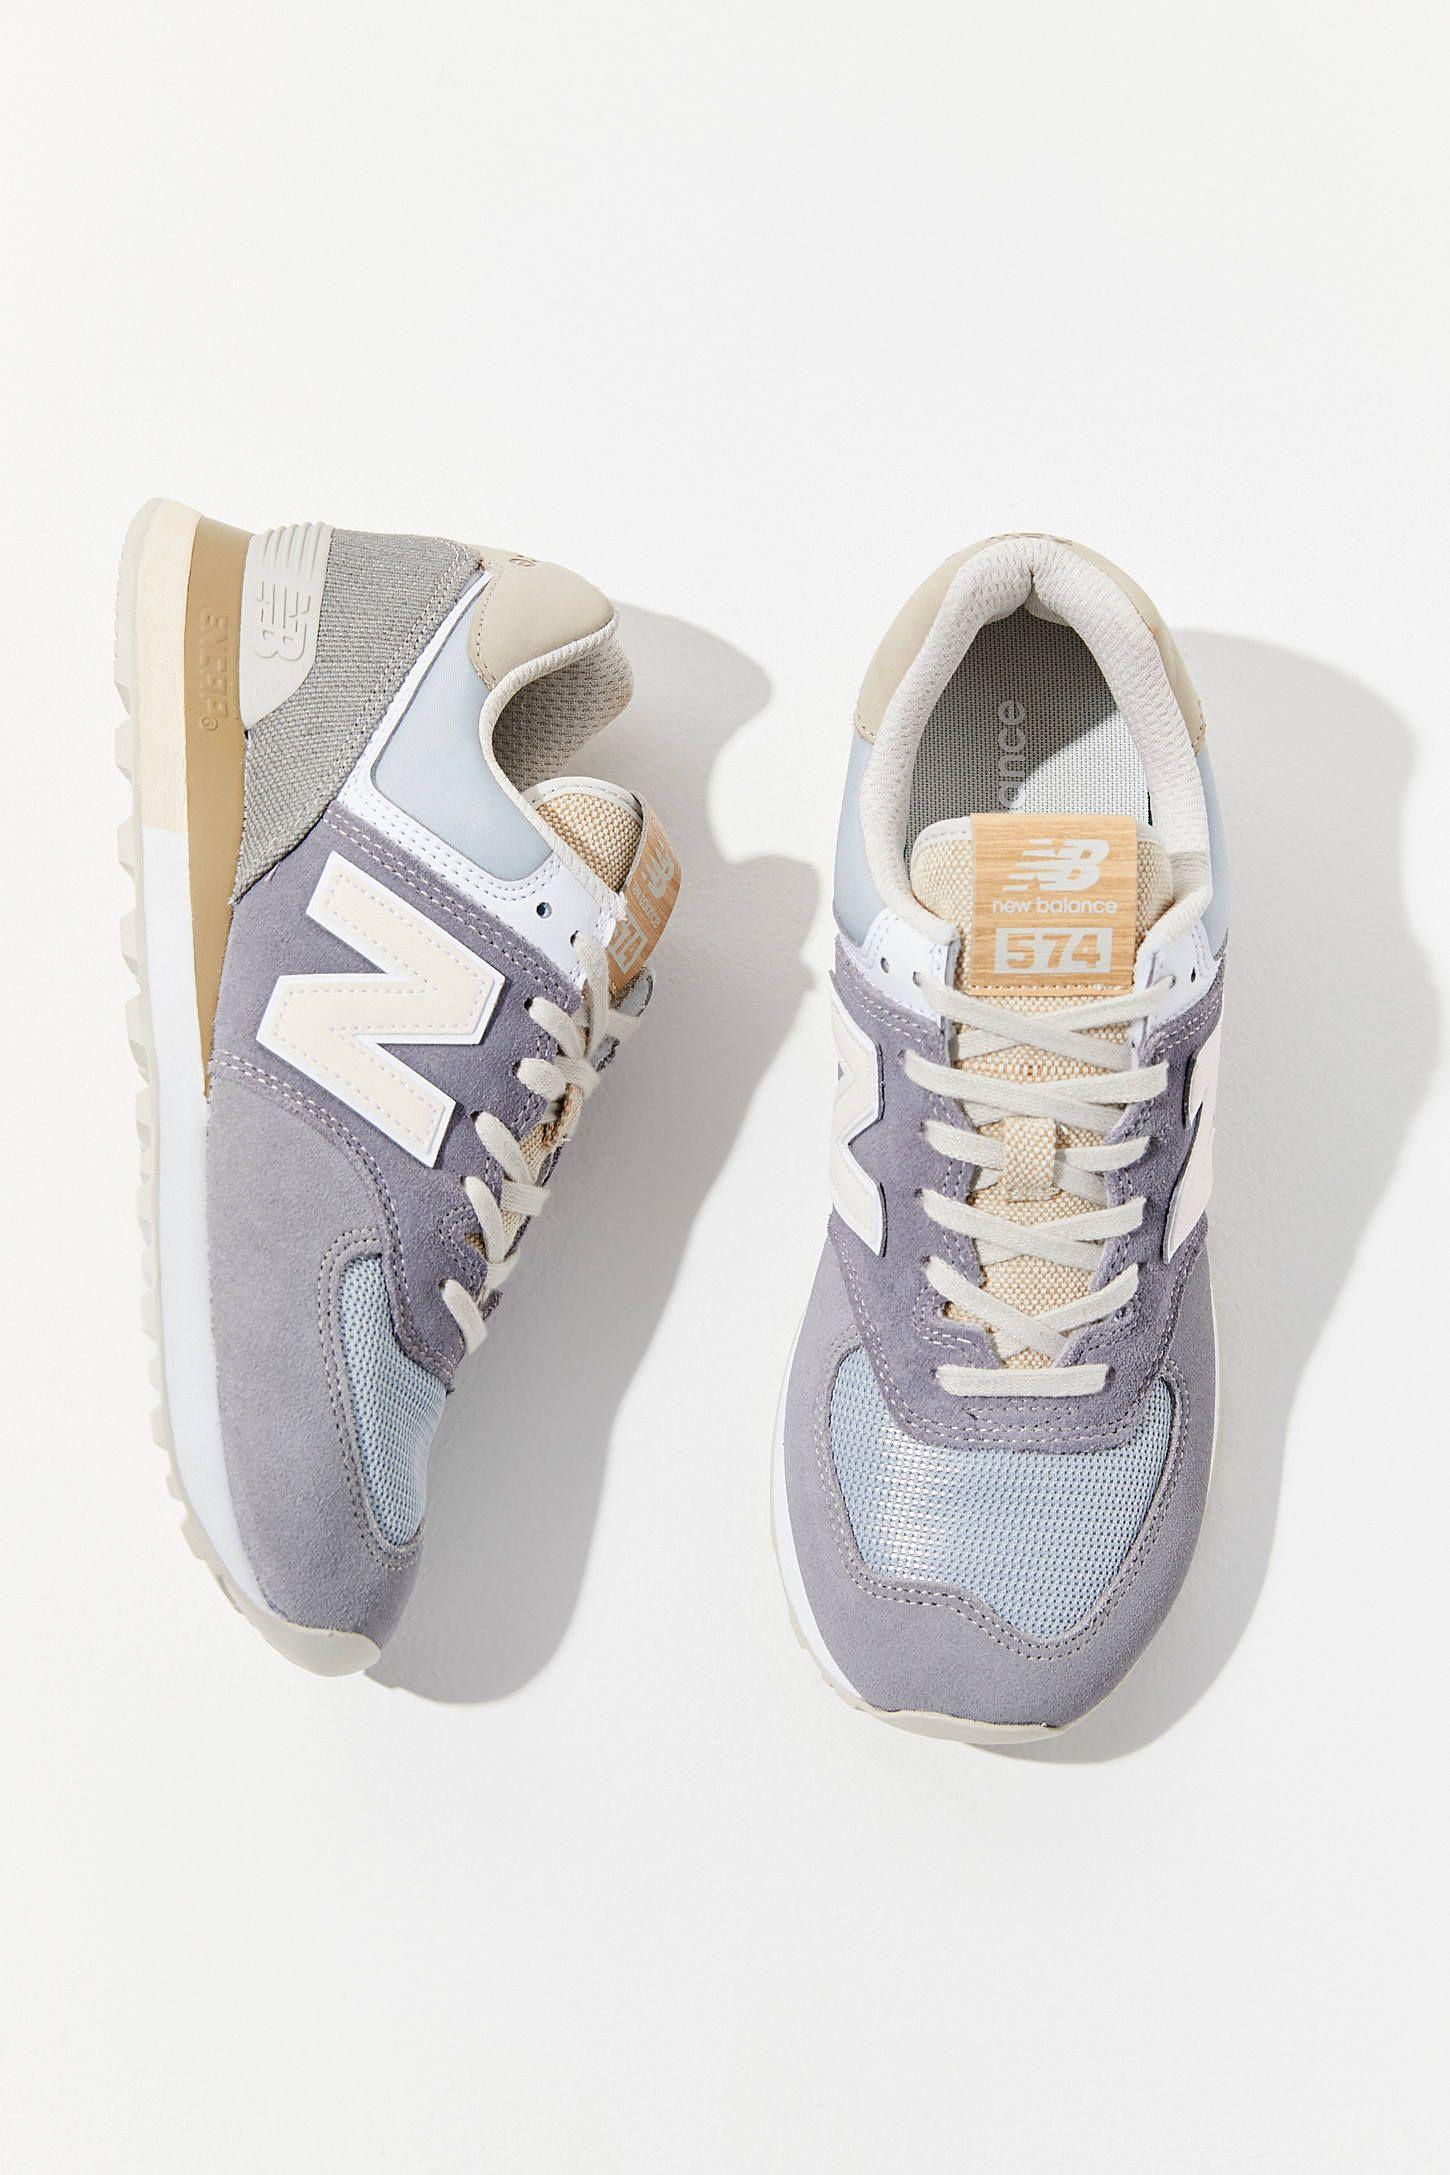 New Balance 574 Retro Surf Sneaker   Shoe Love   New balance